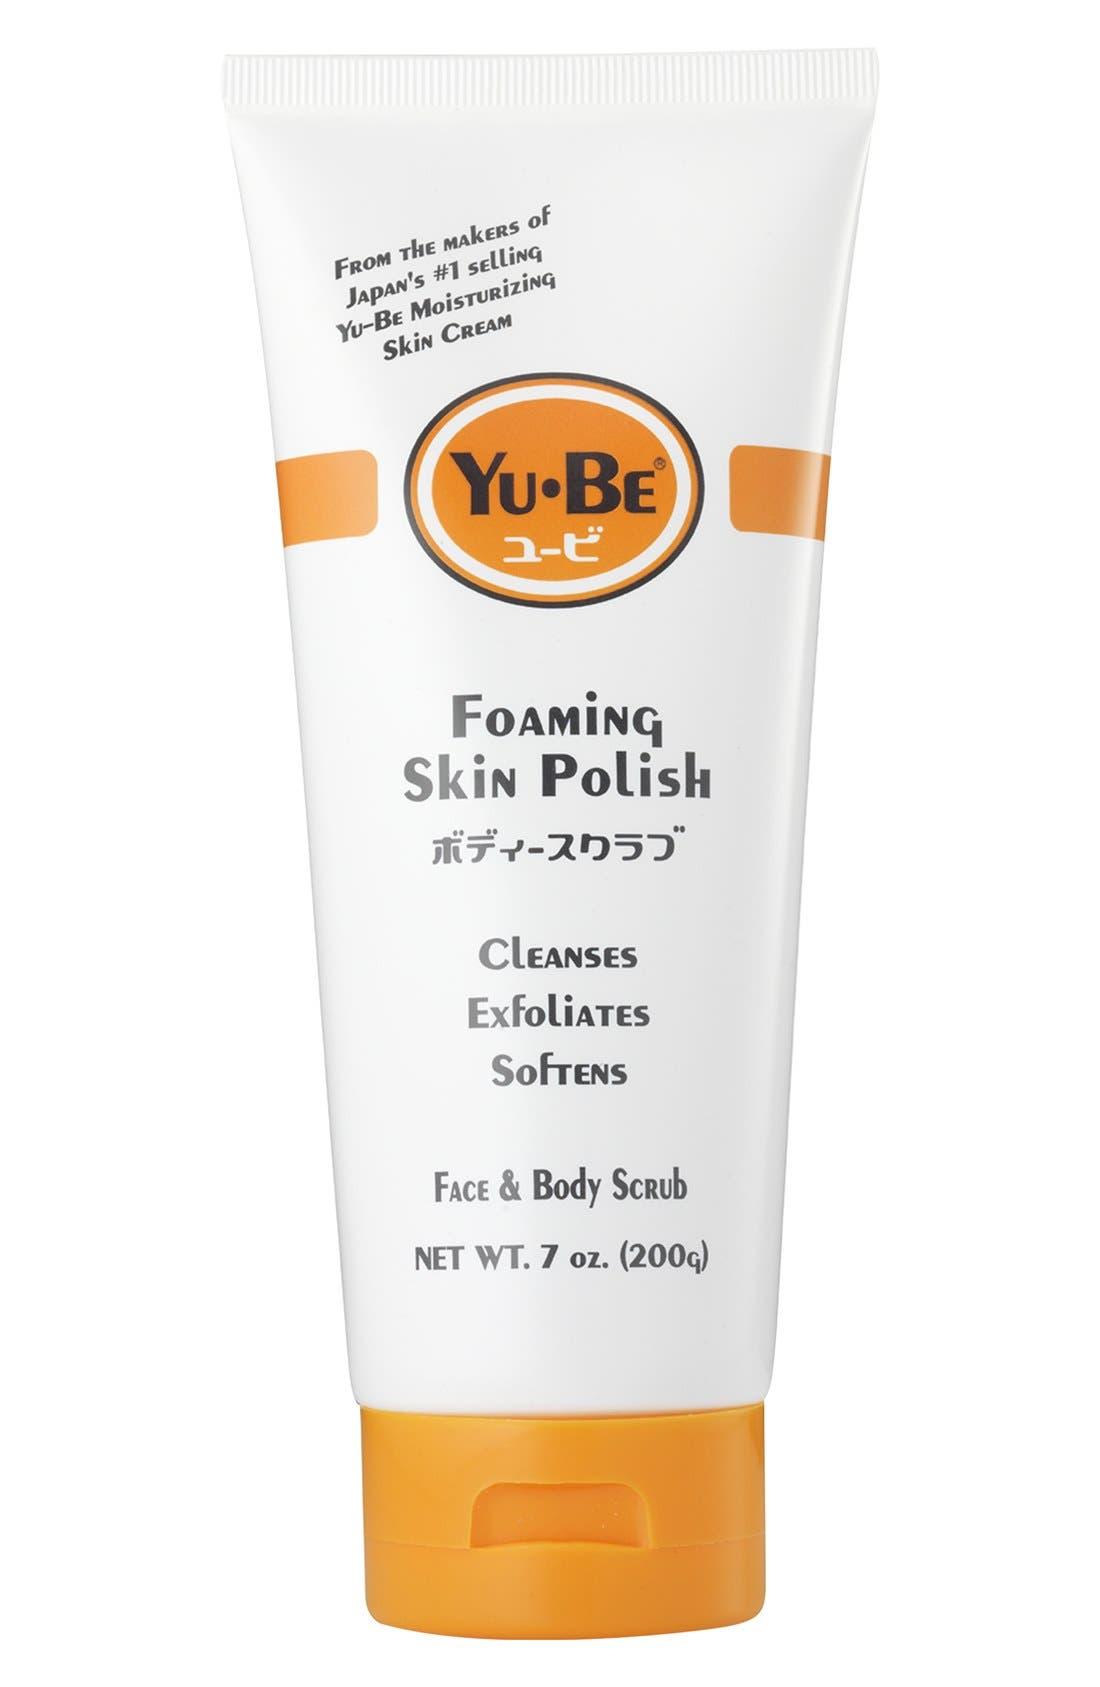 Yu-Be® Foaming Skin Polish